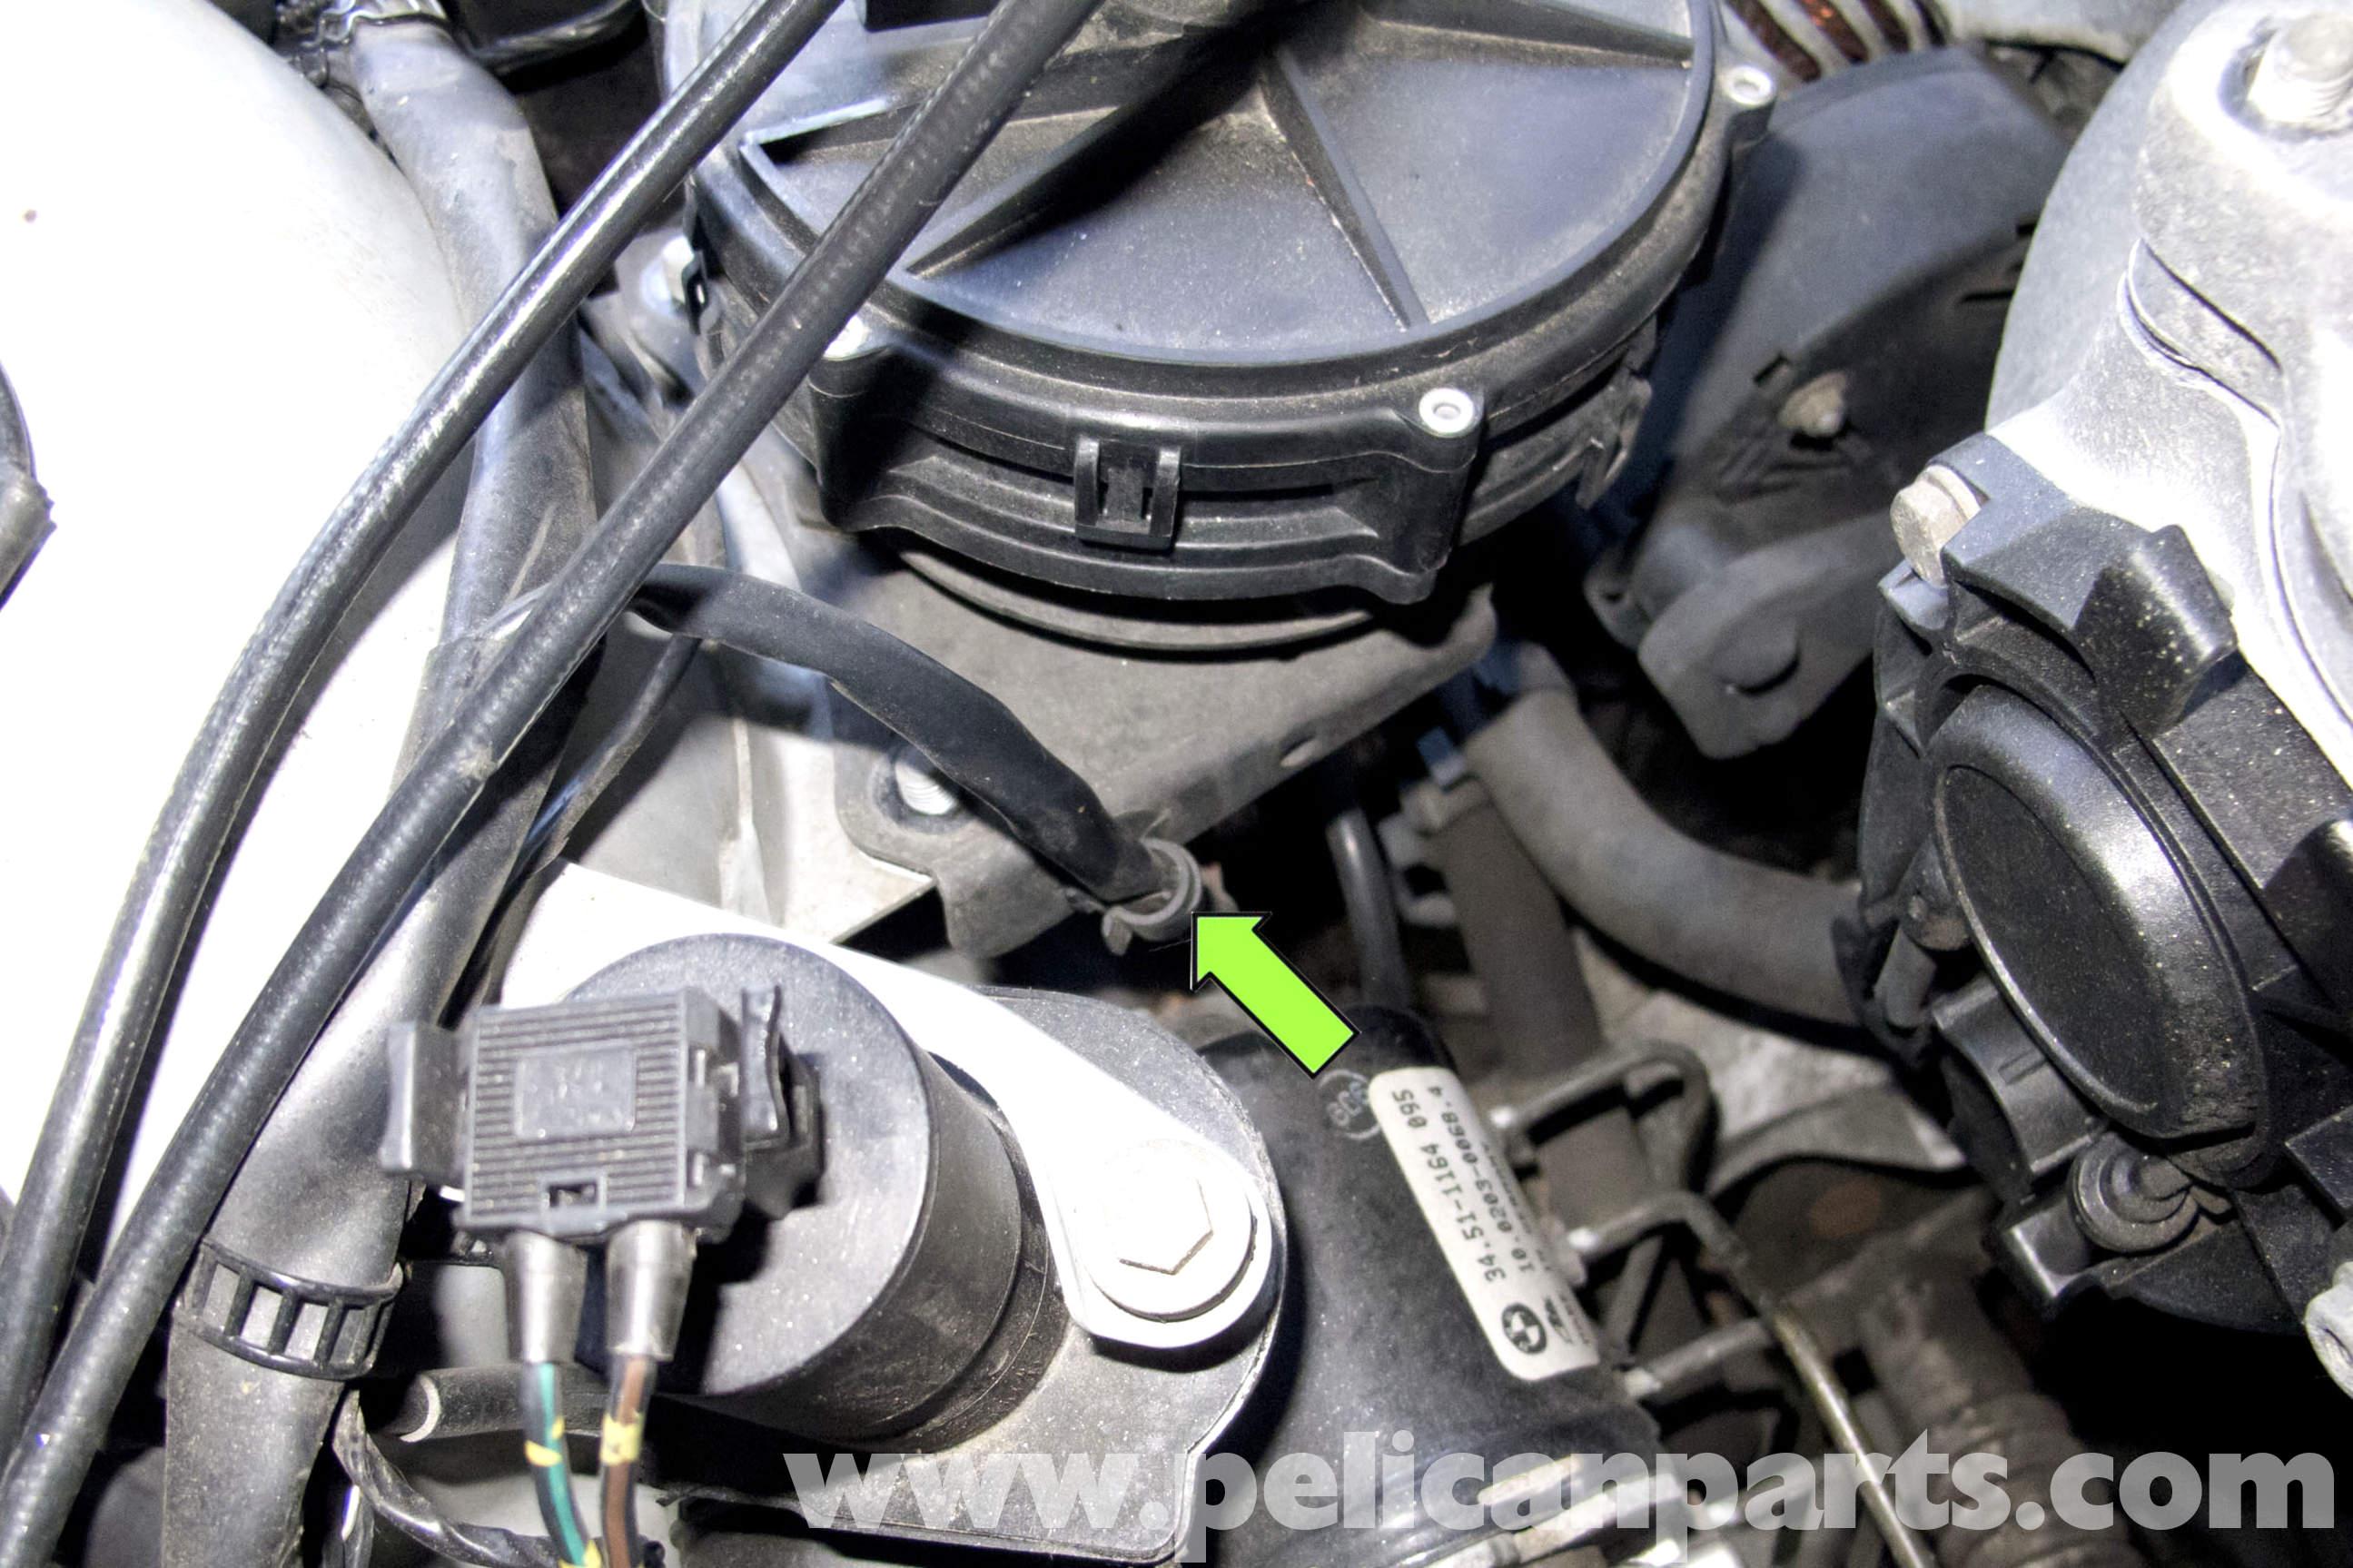 BMW Z3 Alternator Replacement   1996-2002   Pelican Parts DIY ... Bmw Z Alternator Wiring Harness on saab 900 wiring harness, mg midget wiring harness, mazda 3 wiring harness, mercedes e320 wiring harness, ford f100 wiring harness, suzuki samurai wiring harness, volvo 1800 wiring harness, ford contour wiring harness, bmw z3 radio harness, datsun 510 wiring harness, vw beetle wiring harness, bmw z3 radio wiring diagram, porsche 914 wiring harness, jeep cherokee wiring harness, mazda rx7 wiring harness, amc amx wiring harness, triumph tr8 wiring harness,